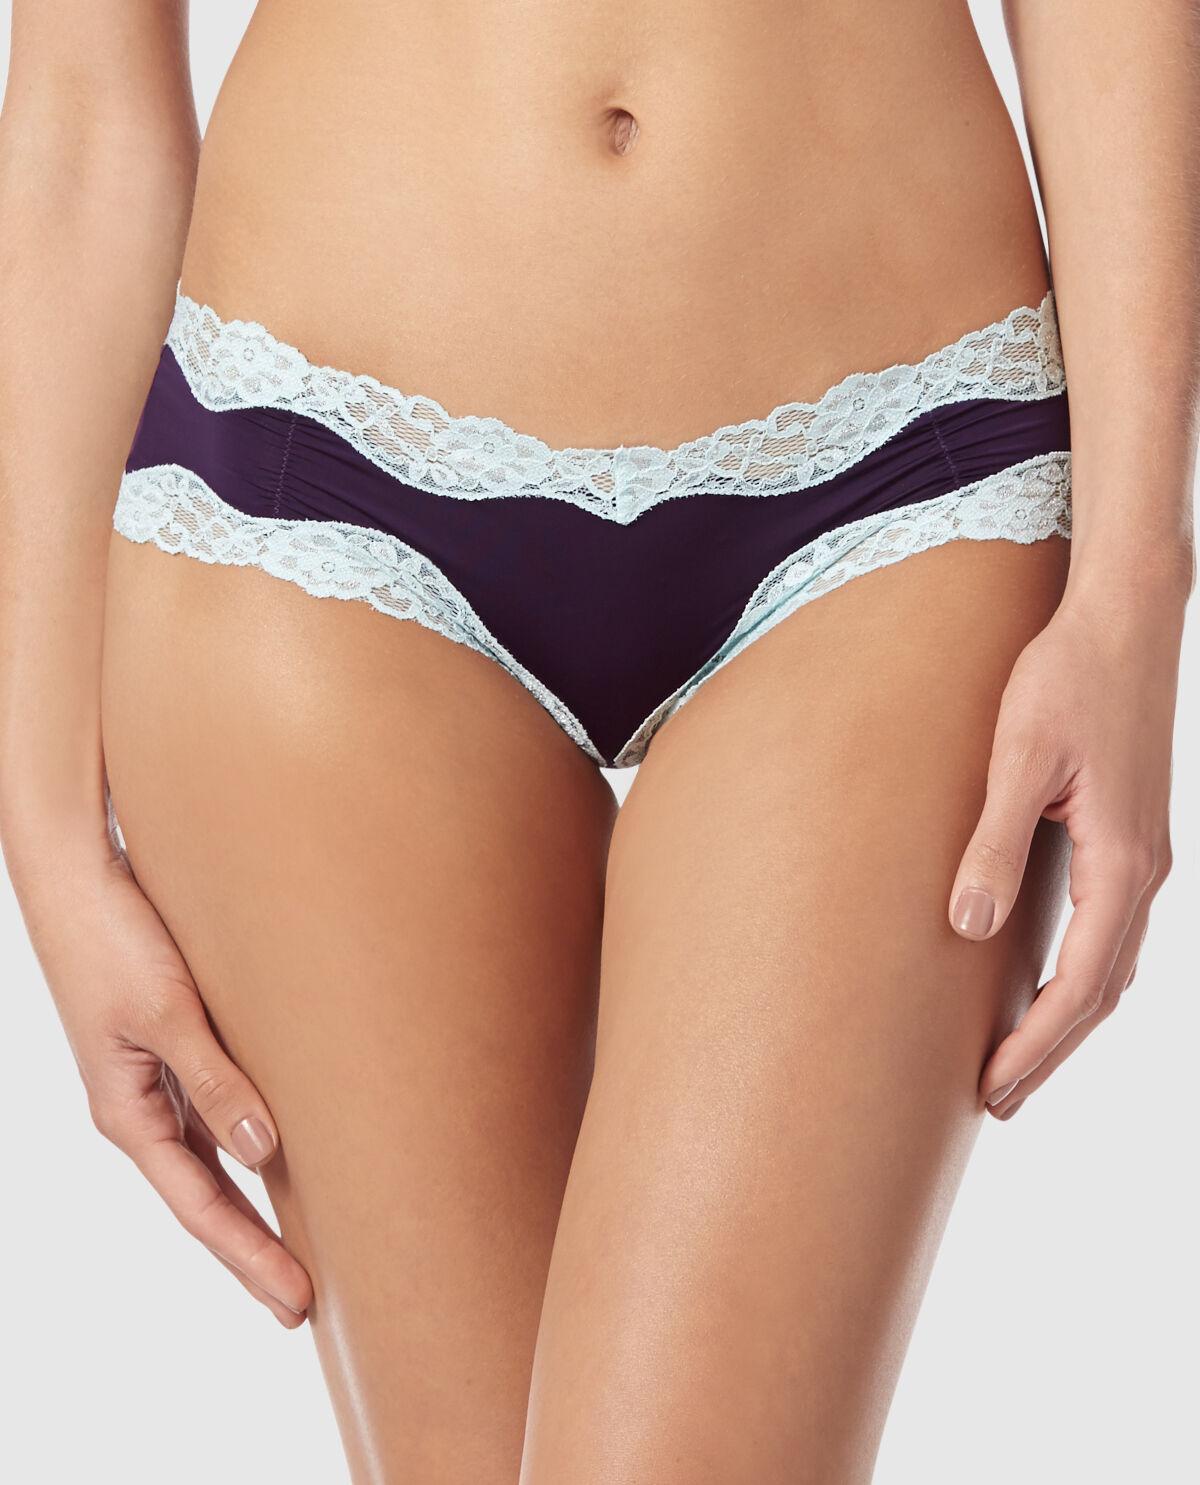 Selena gomez nude fake tape nipple